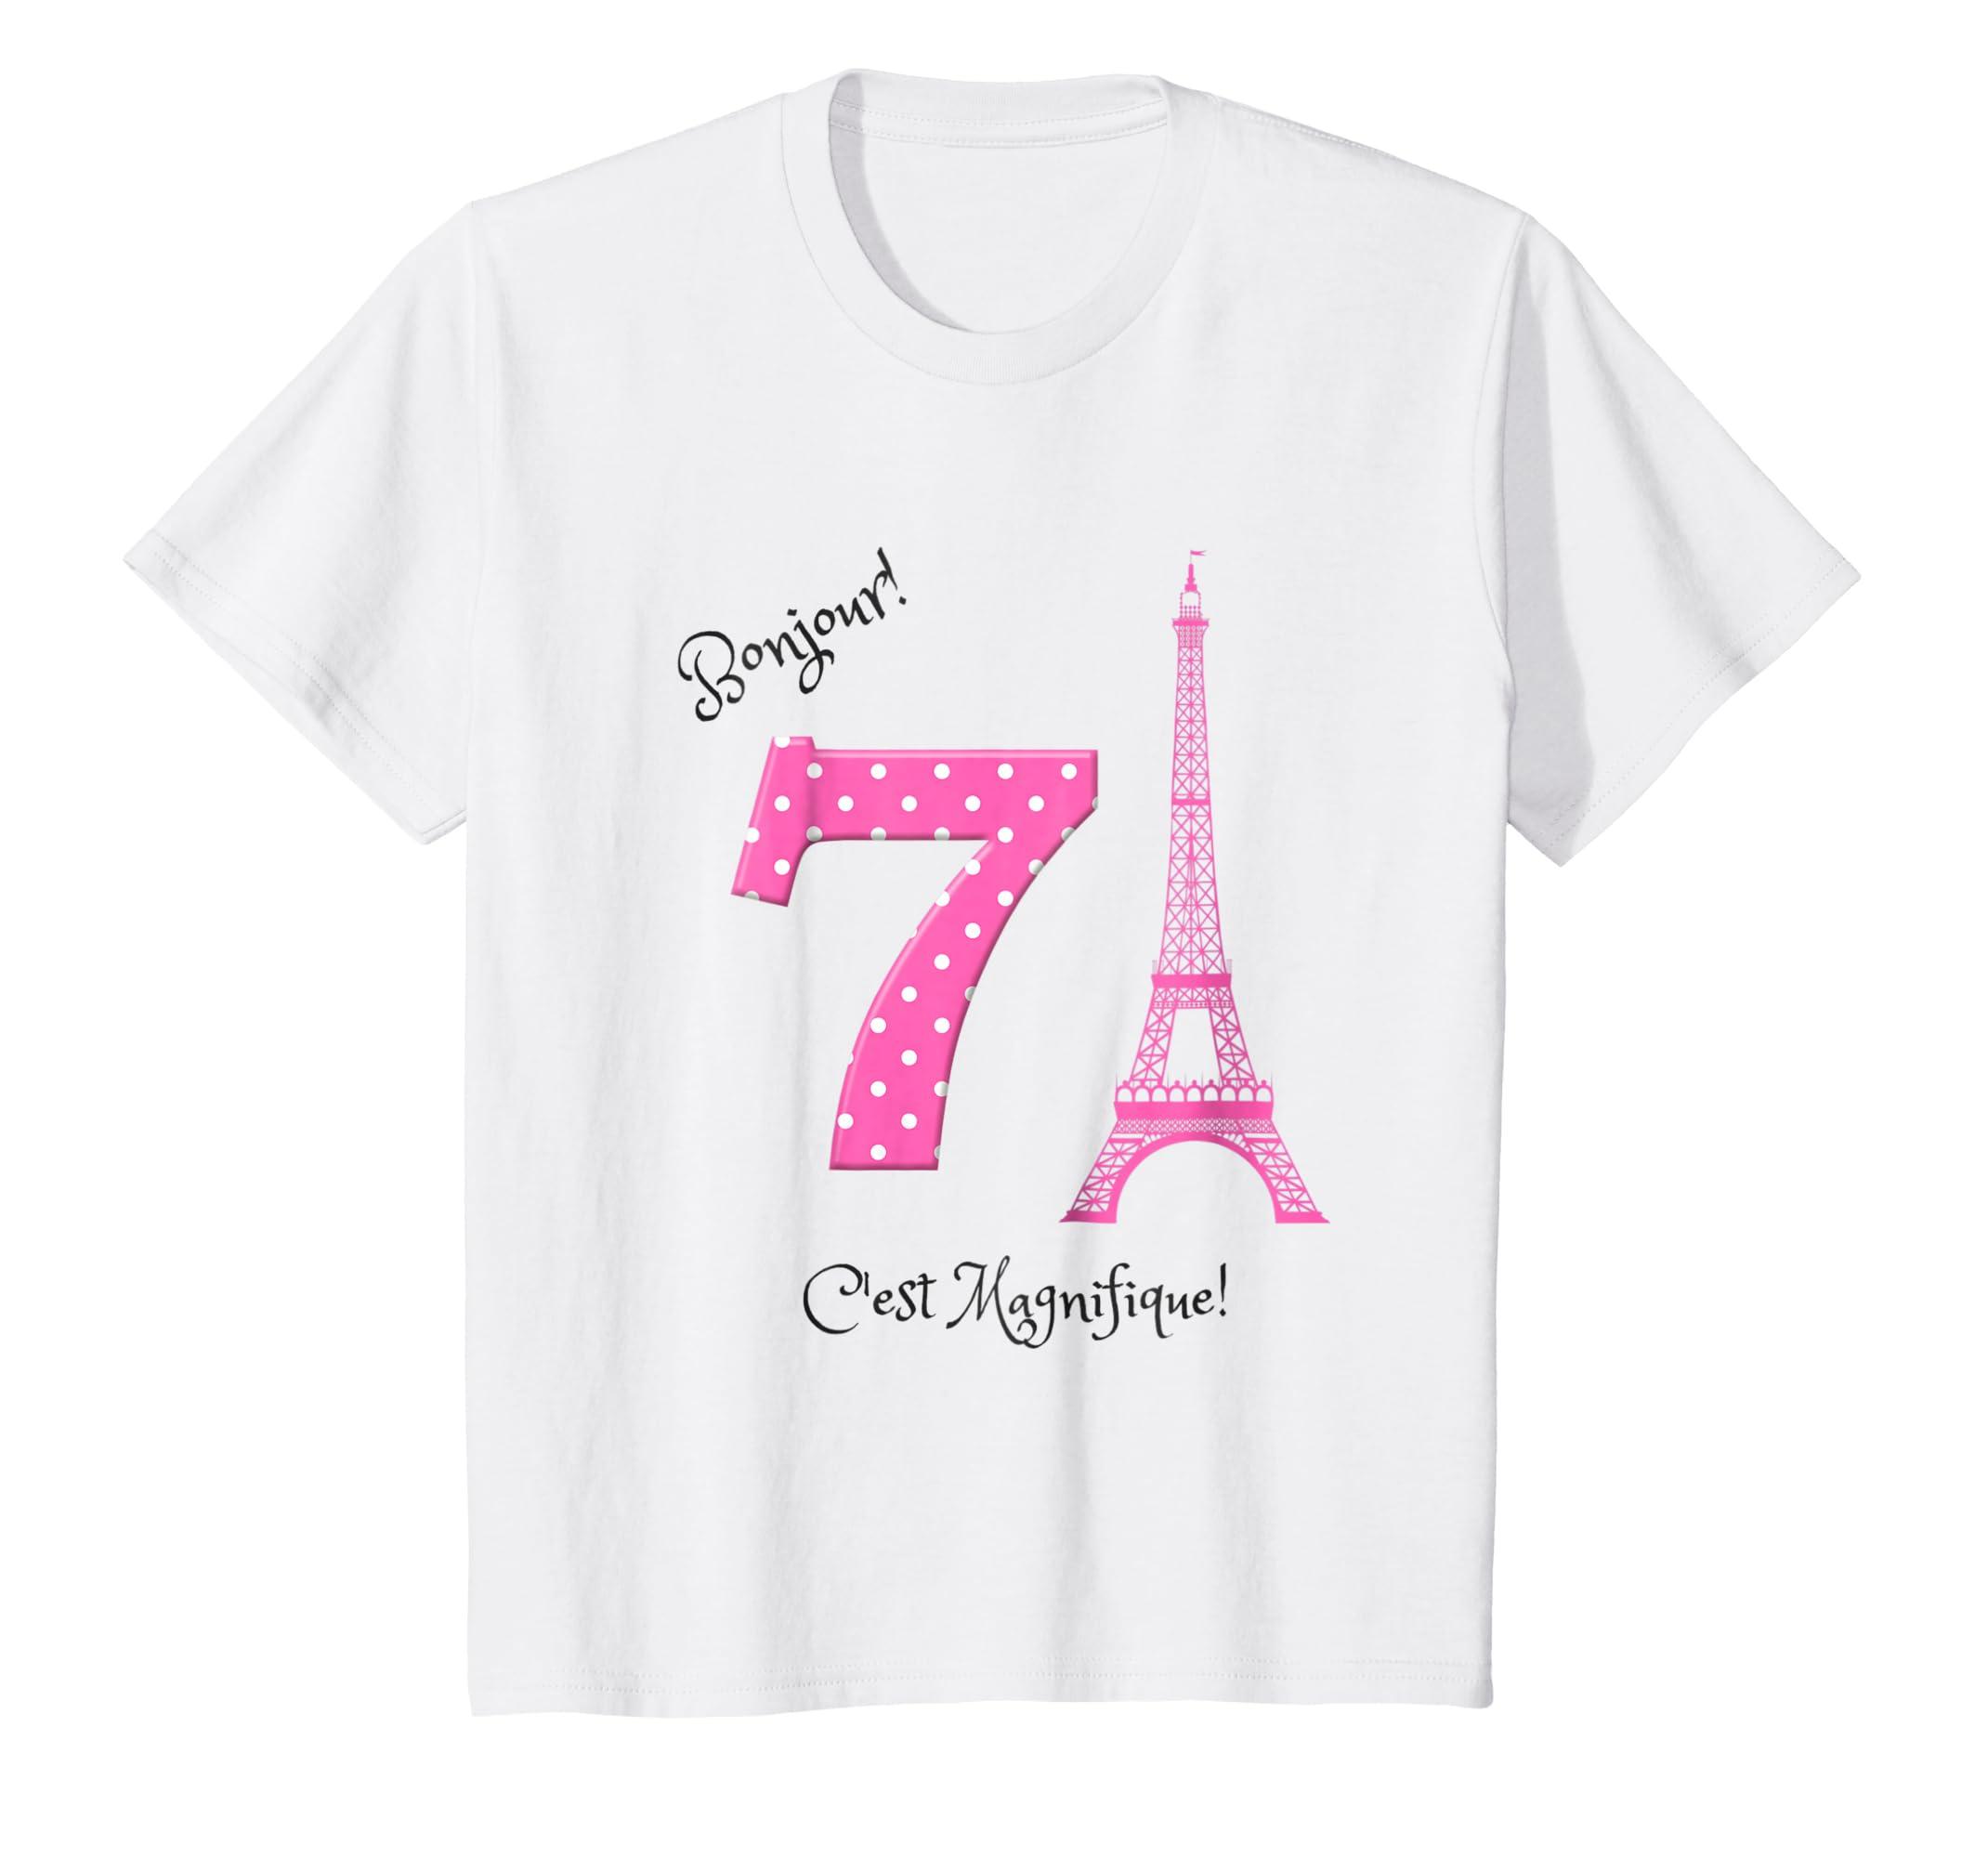 Amazon Kids A Day In Paris Girls Seventh Birthday Shirt Clothing